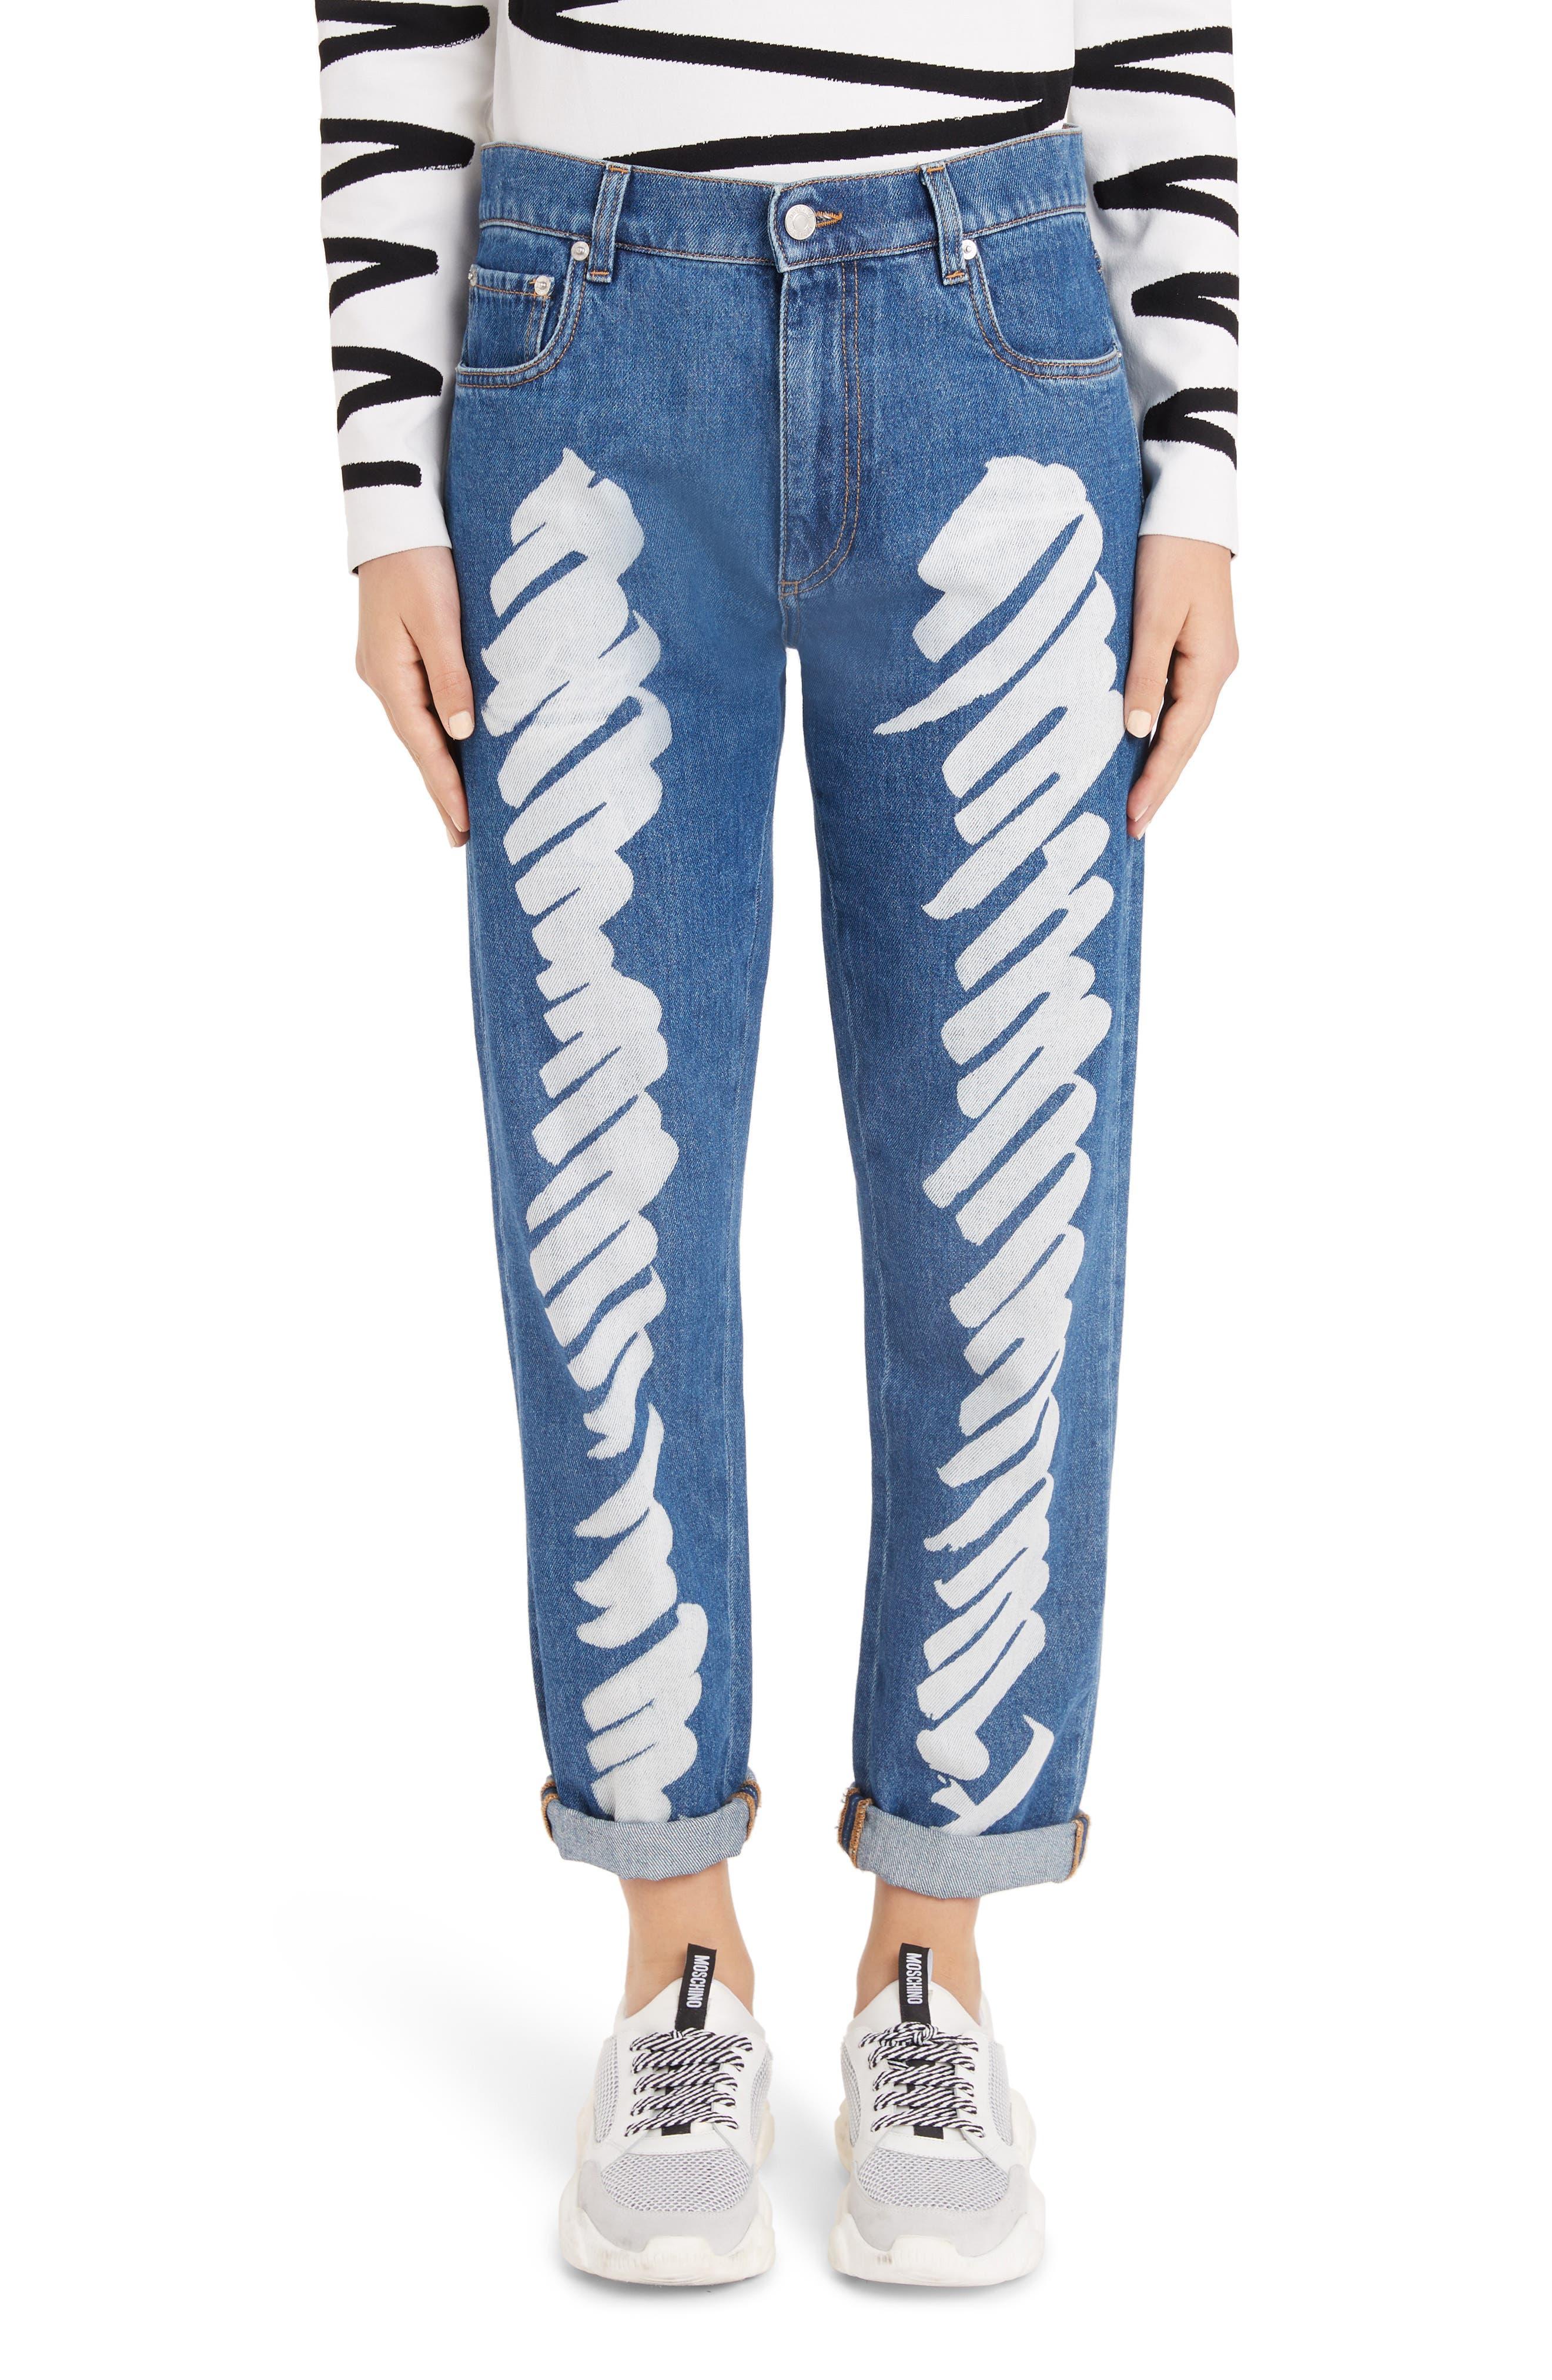 MOSCHINO, Scribble Straight Leg Jeans, Main thumbnail 1, color, DENIM